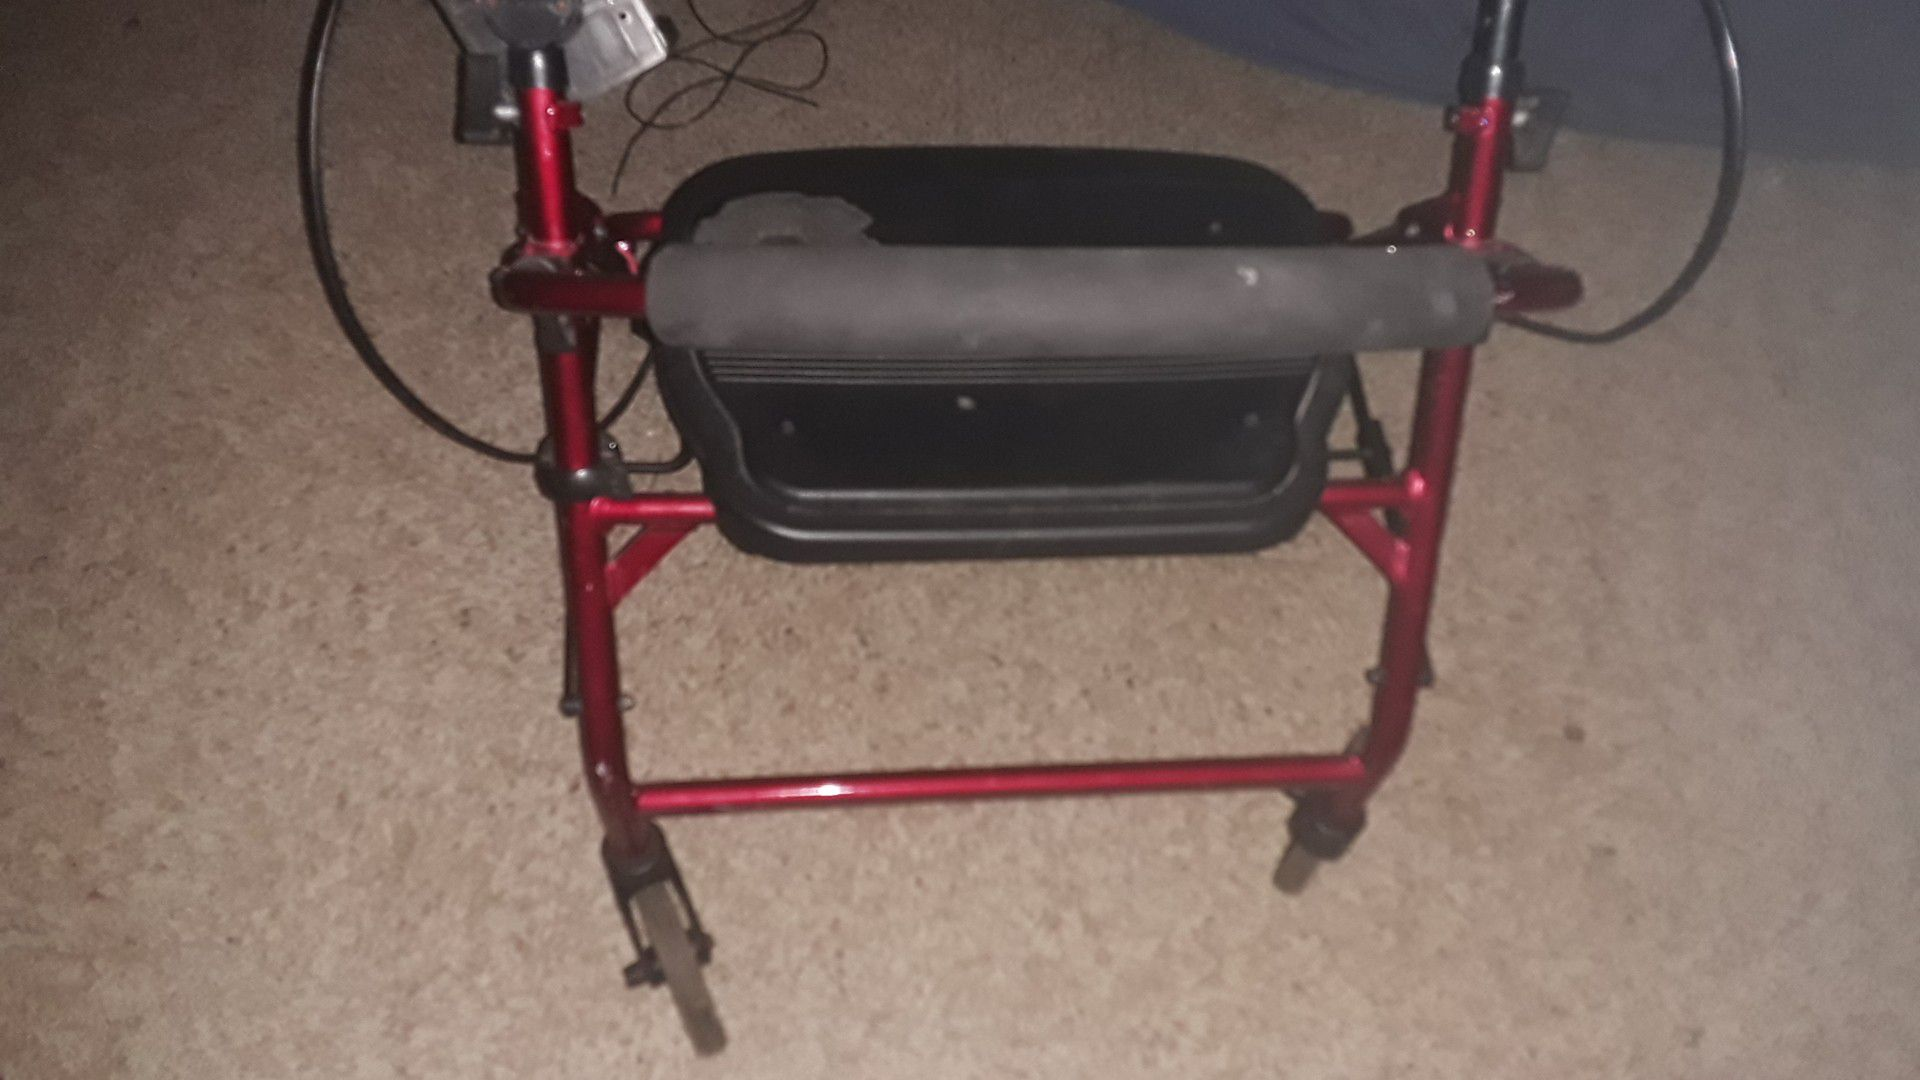 Sitting wheel chair